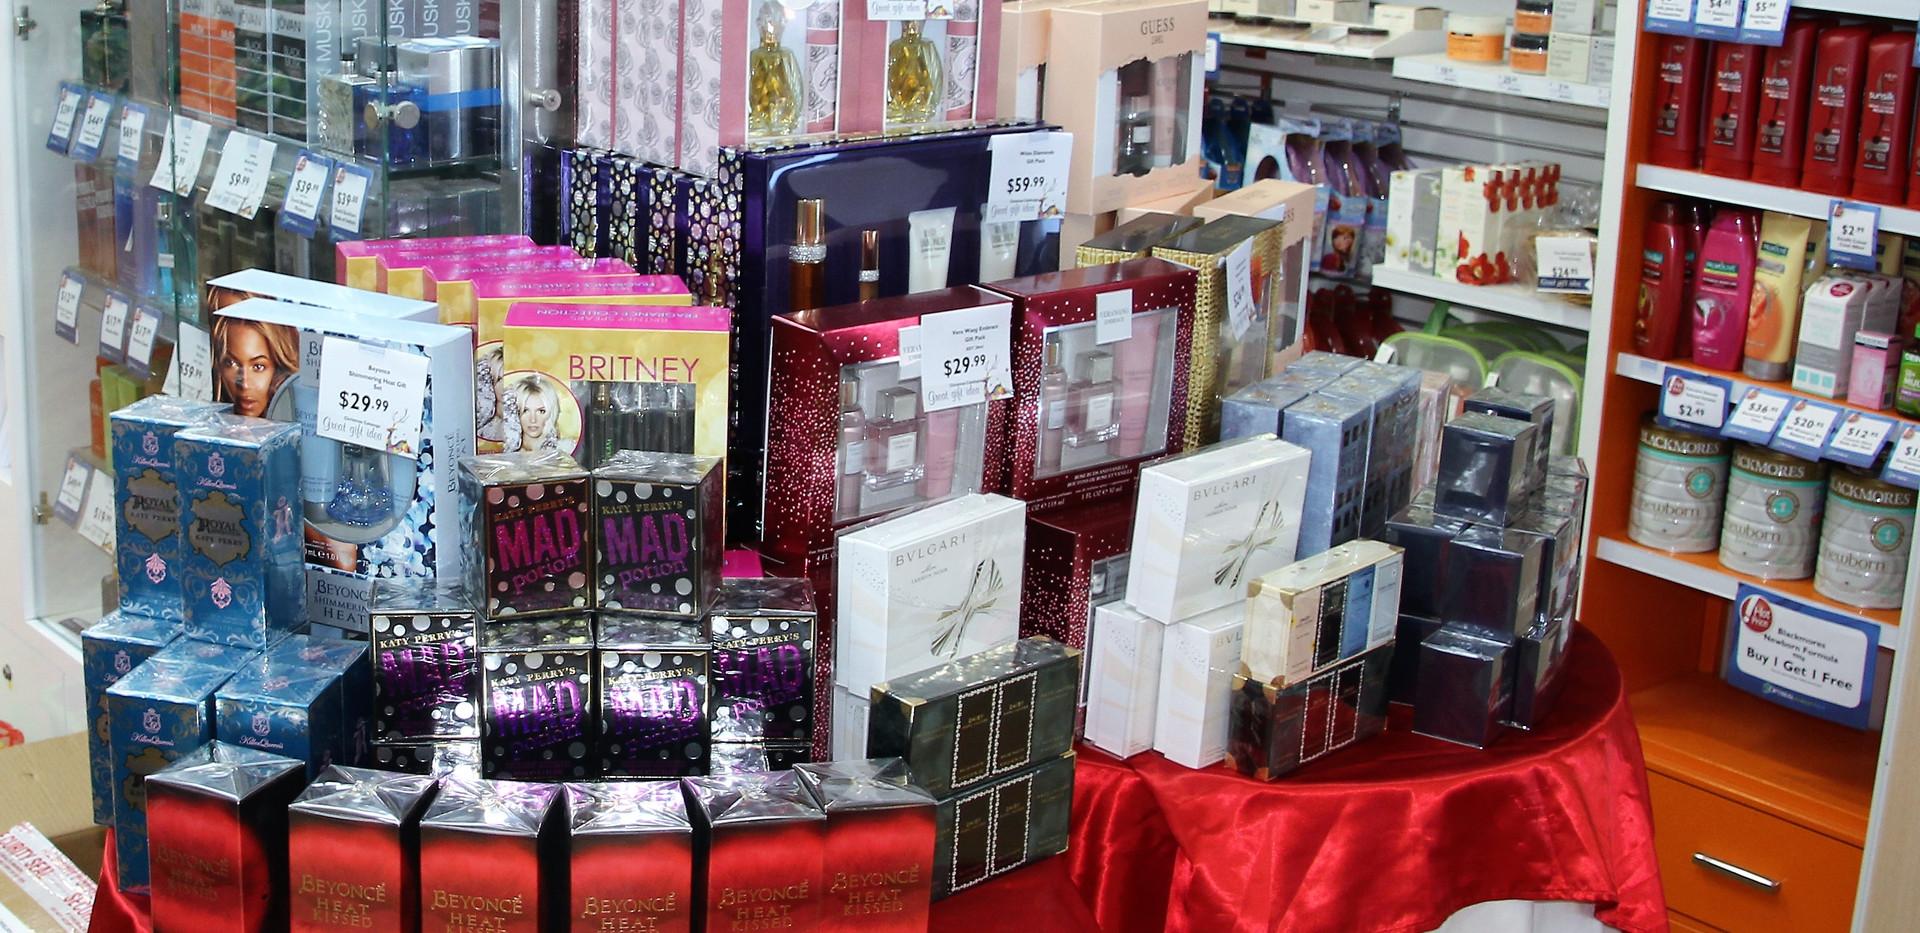 Pharmacy perfume.JPG